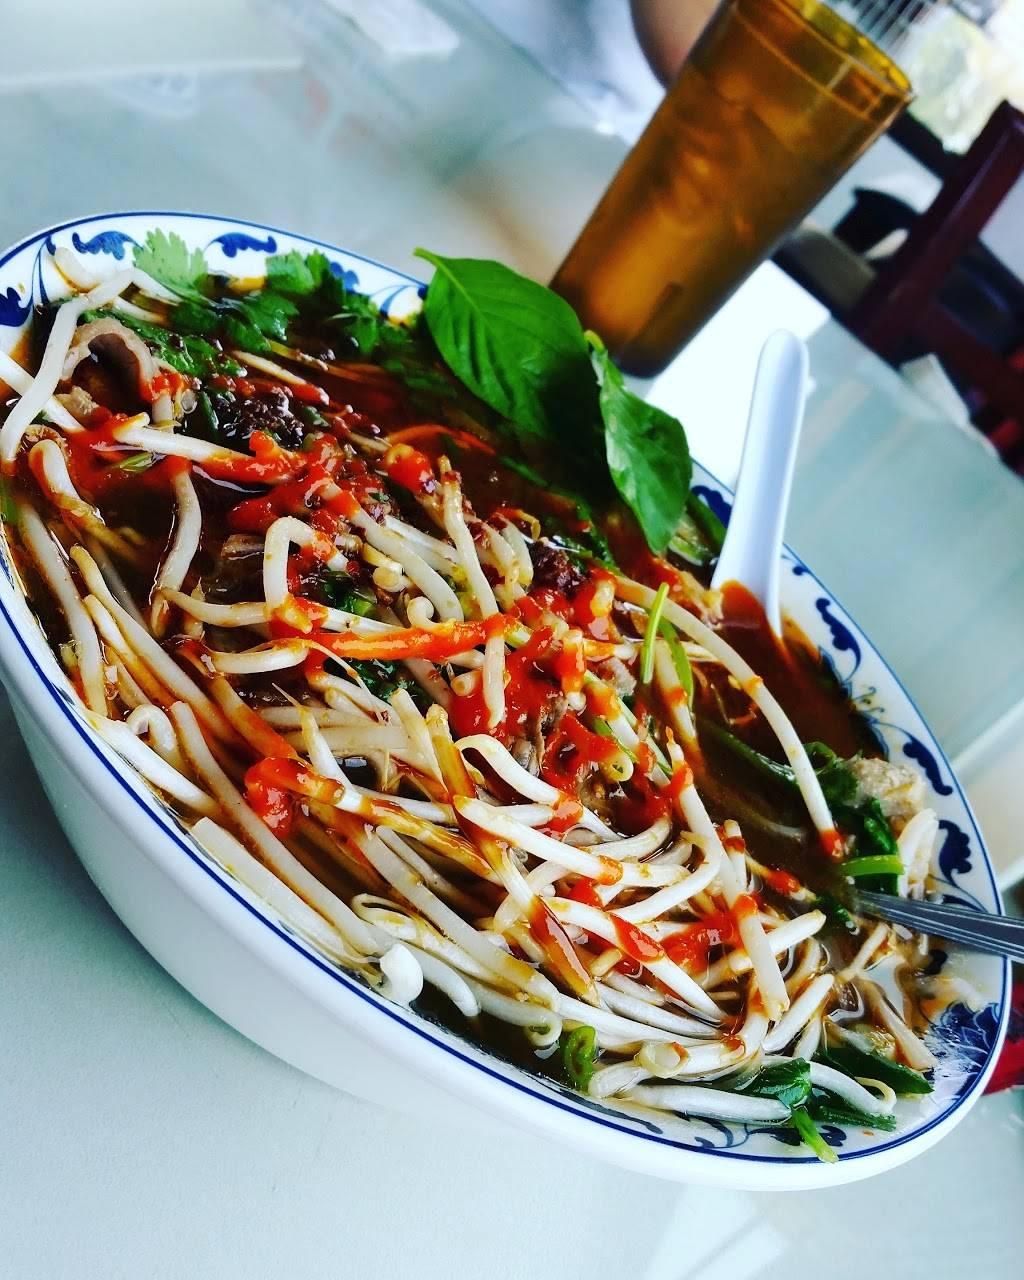 Noodle #9   restaurant   1439 N El Dorado St Ste. A, Stockton, CA 95202, USA   2099109801 OR +1 209-910-9801